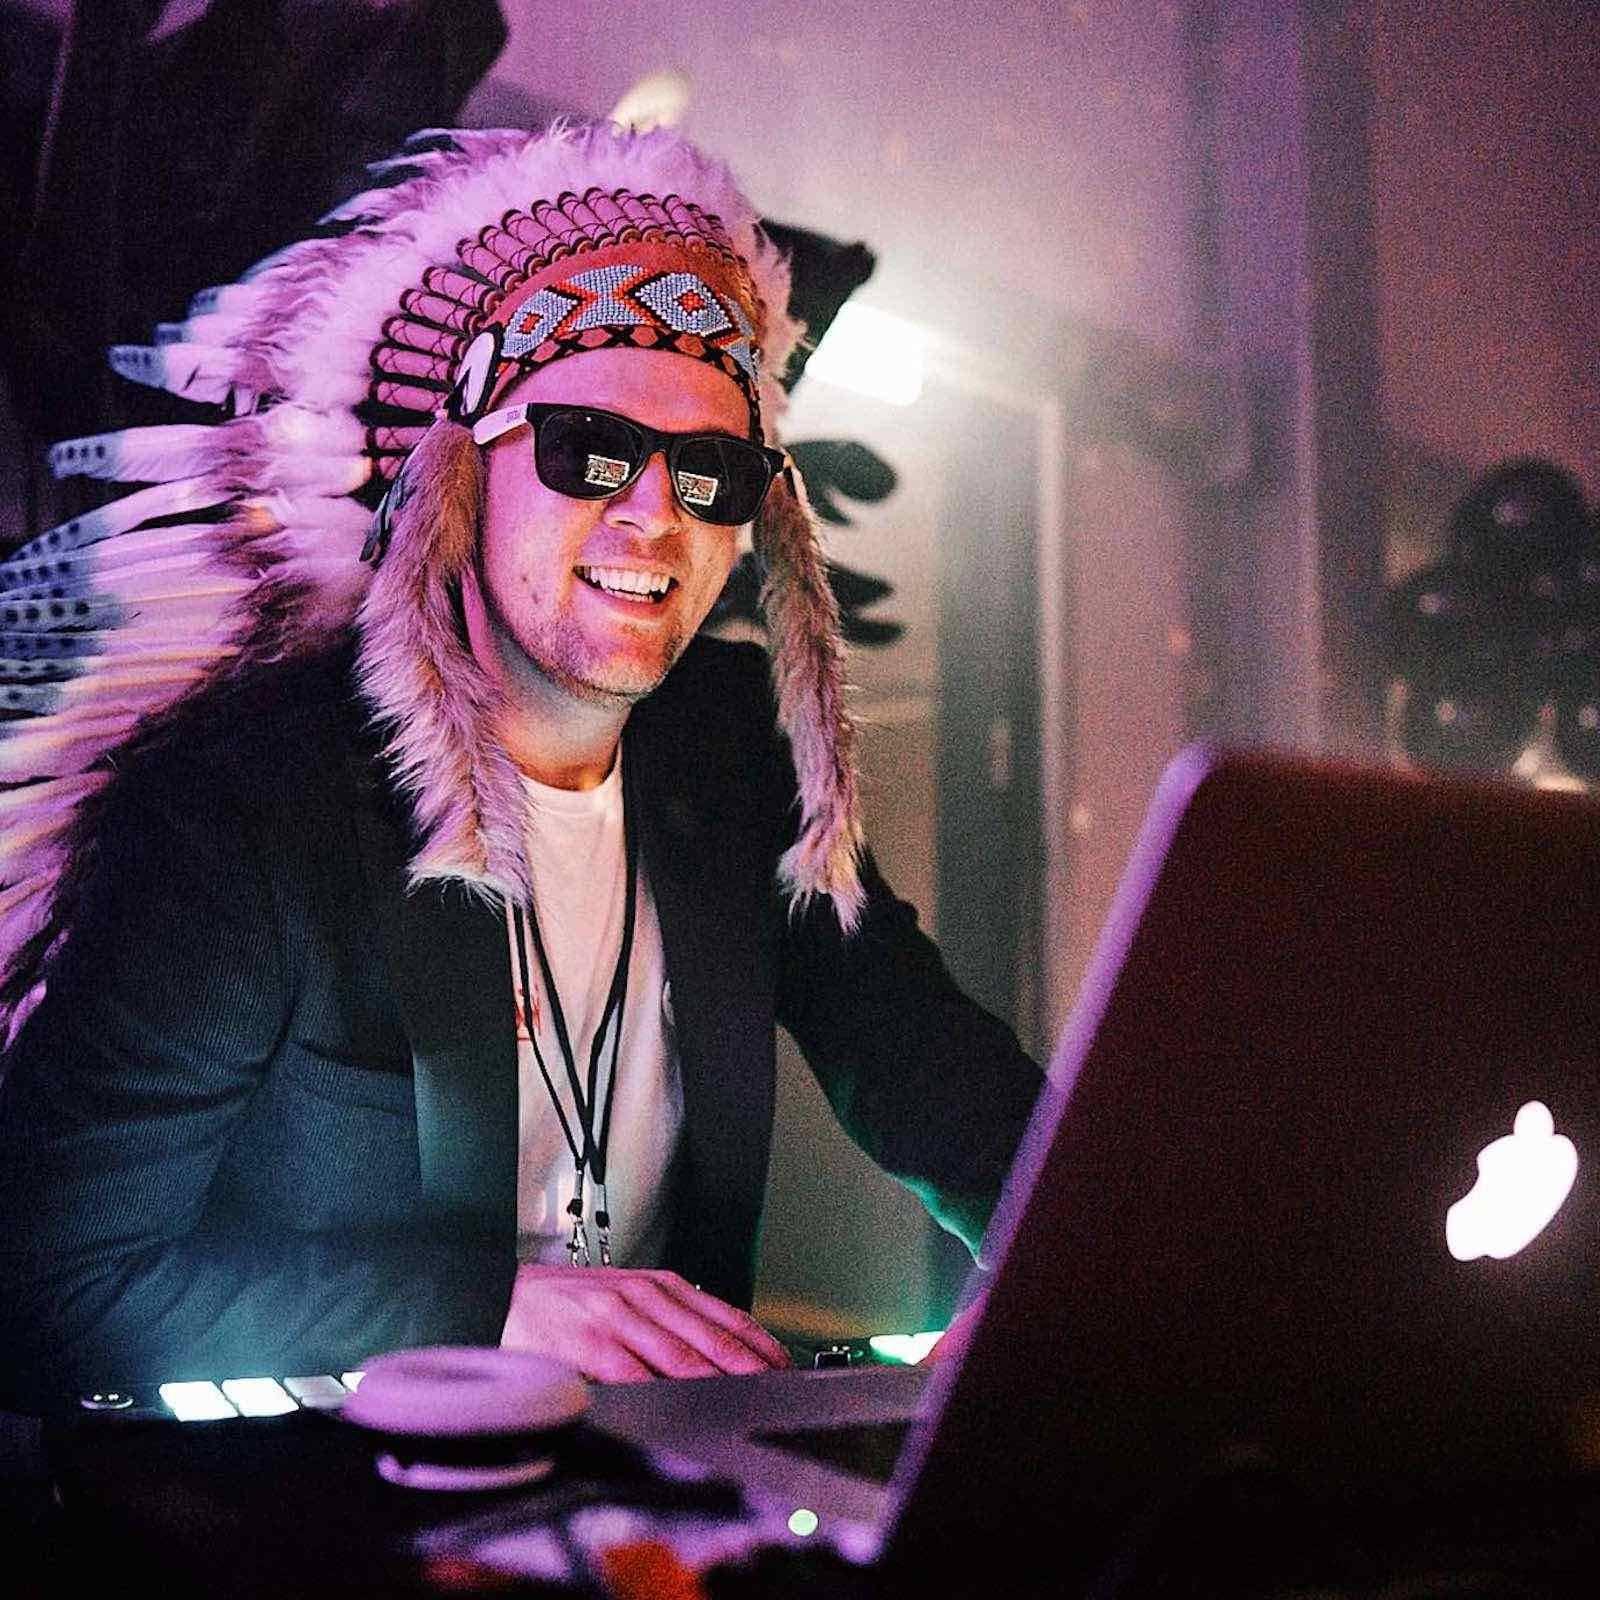 Hochzeits | DJ | Buchen | Hamburg | DJ | Hochzeit | DJ | Geburtstag | DJ | Betriebsfeier | DJ | Buchen | Discjockey | Mieten | DJ | Agentur | DJ | Timm | Hamburgfeiert